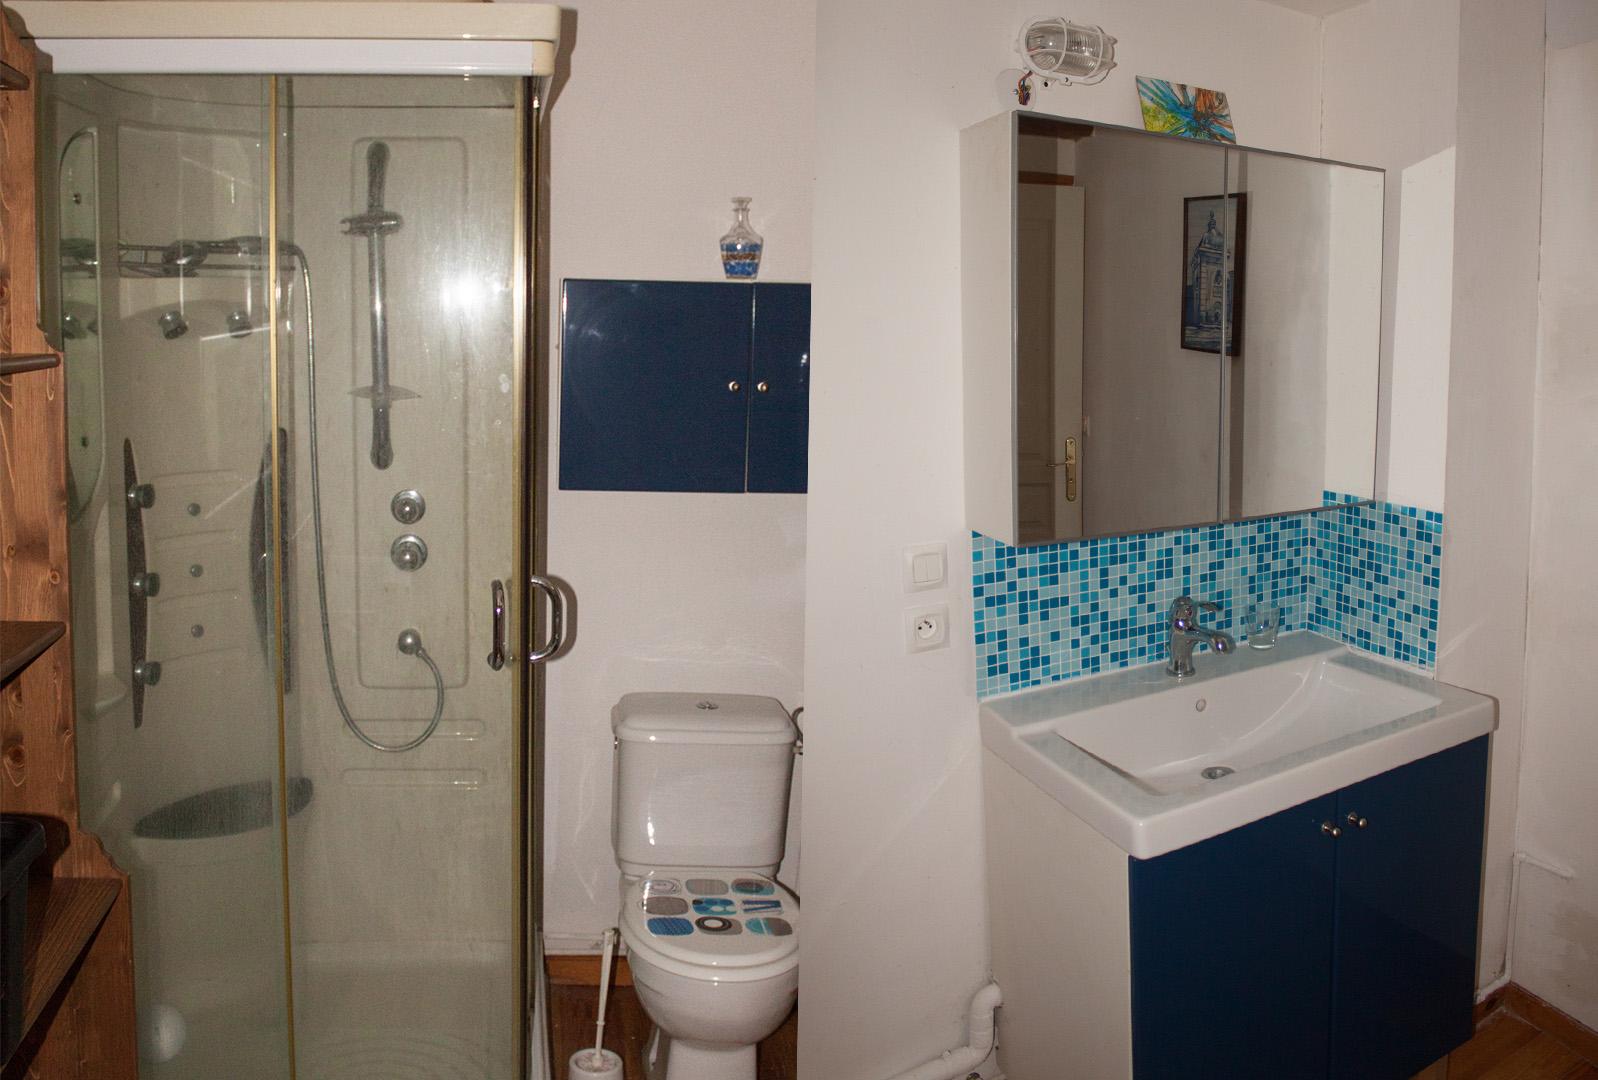 Ombrassa salle de bain